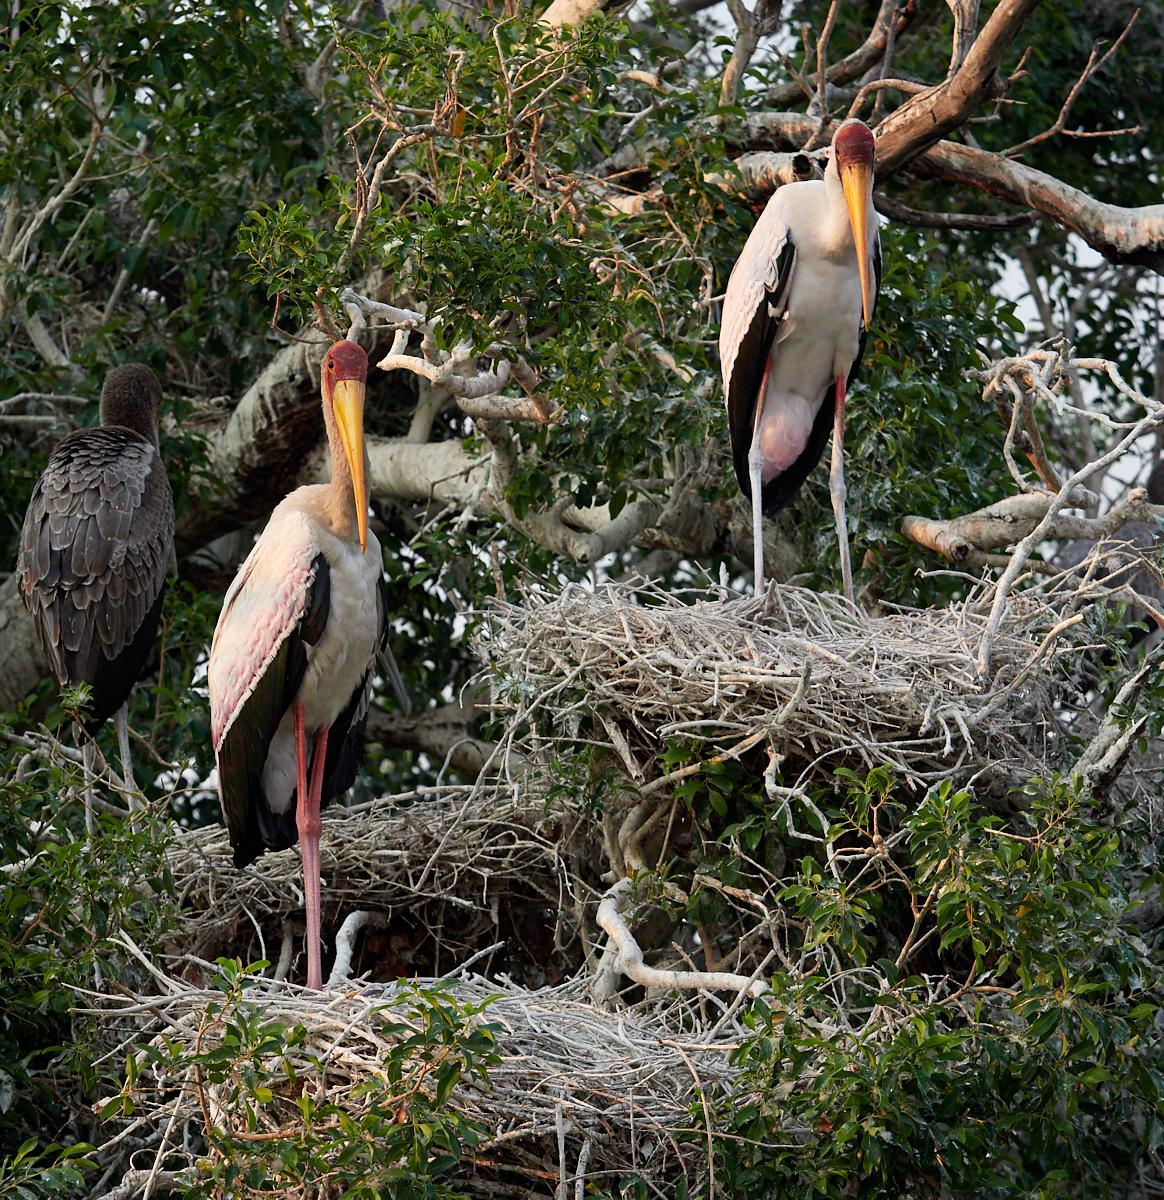 Yellow billed storks on nests 1600x1200 sRGB.jpg